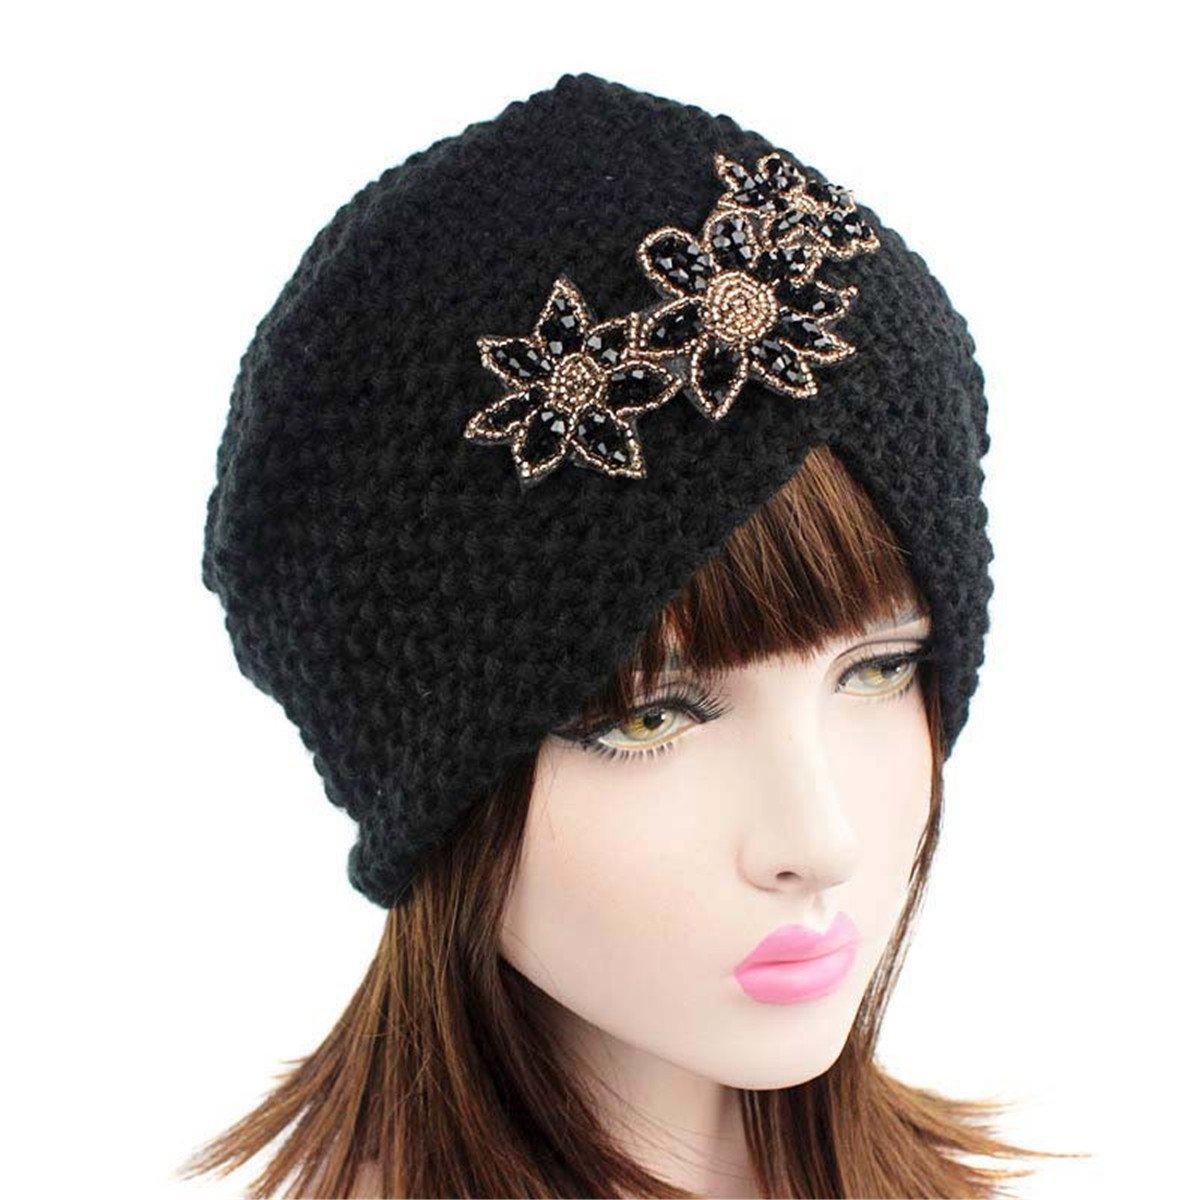 Amazon.com: Qhome Ladies Winter Warm Turban Soft Knit Headband Beanie Crochet Headwrap Women Hat Cap with Beaded Jewelry: Clothing